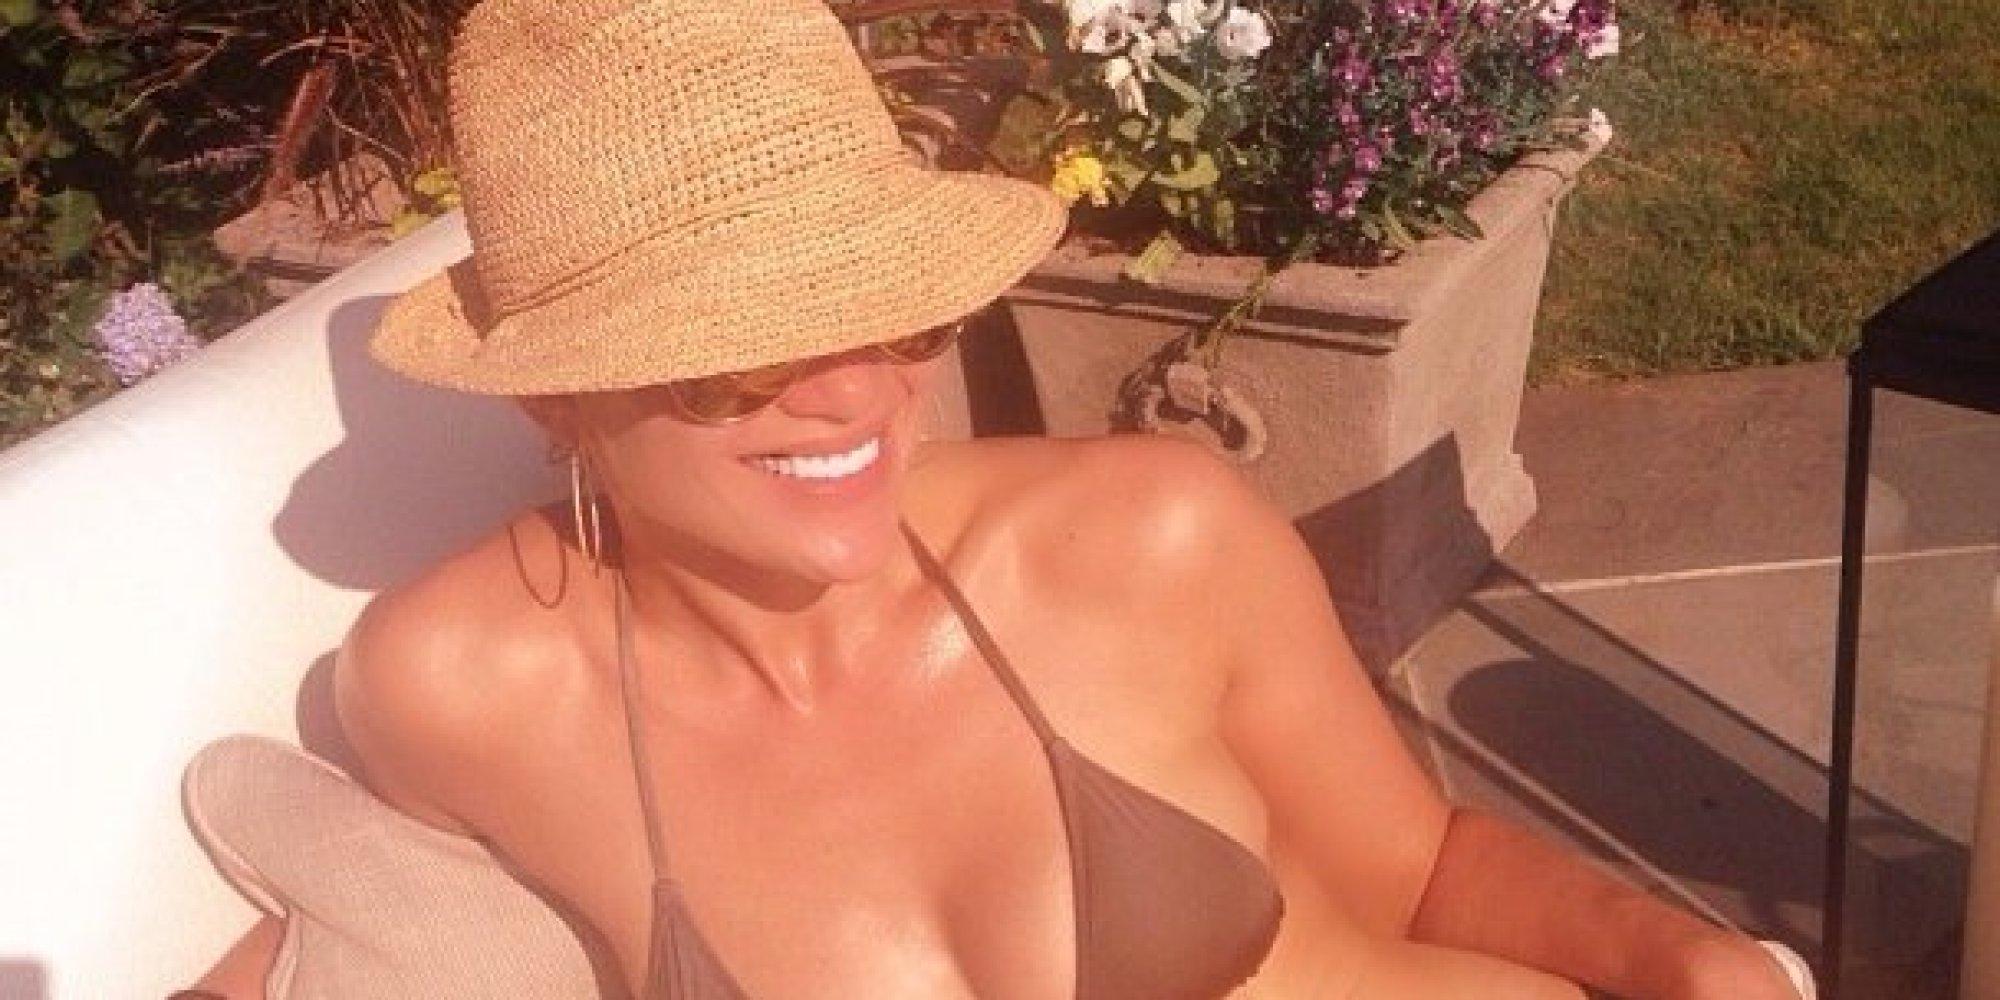 Leah Remini In A Bikini 68